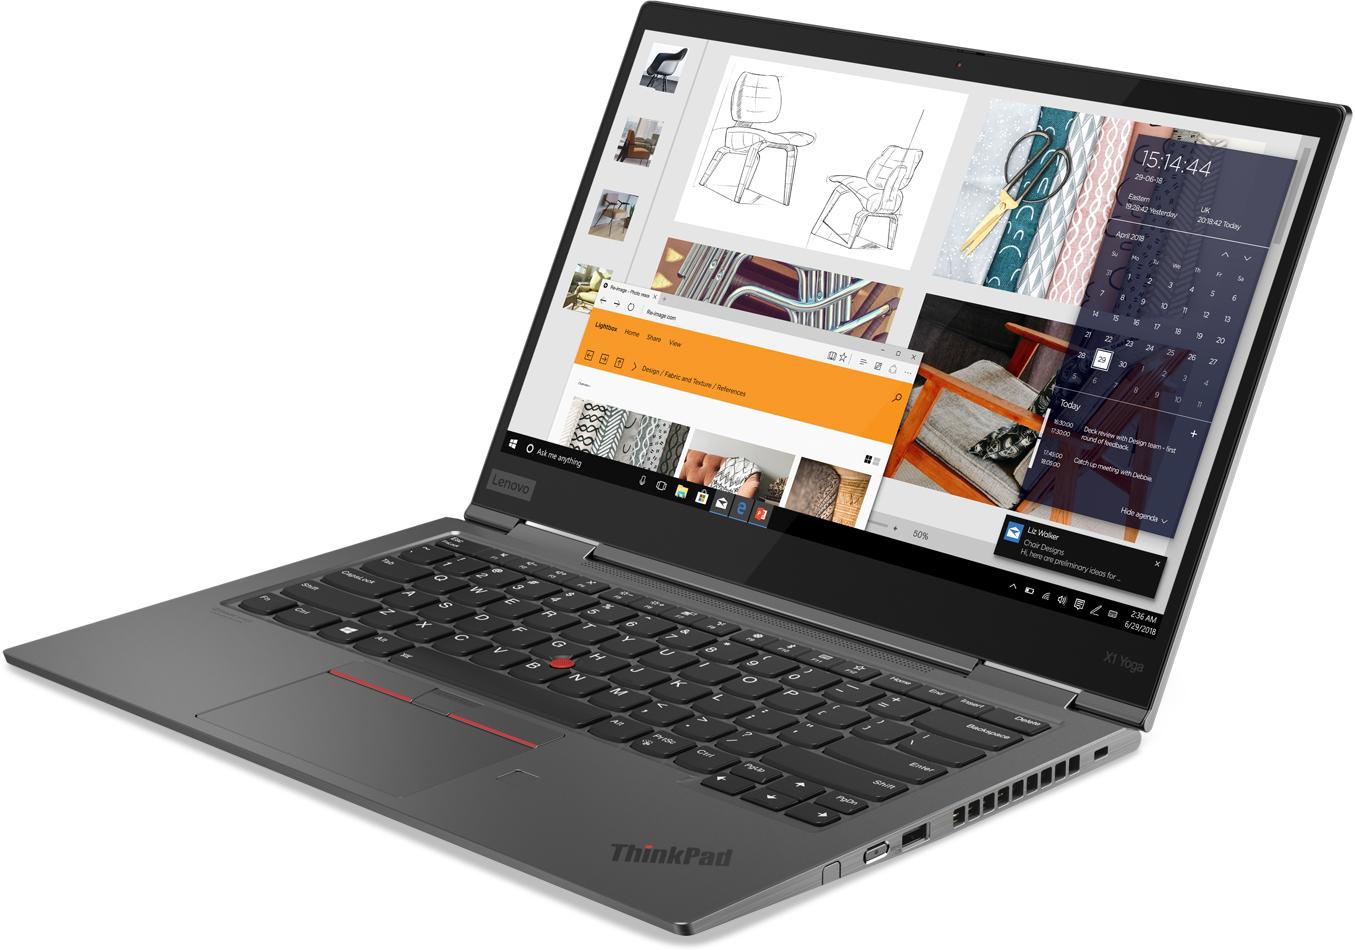 Lenovo's 2019 ThinkPad X1 Yoga: An Ultralight Convertible